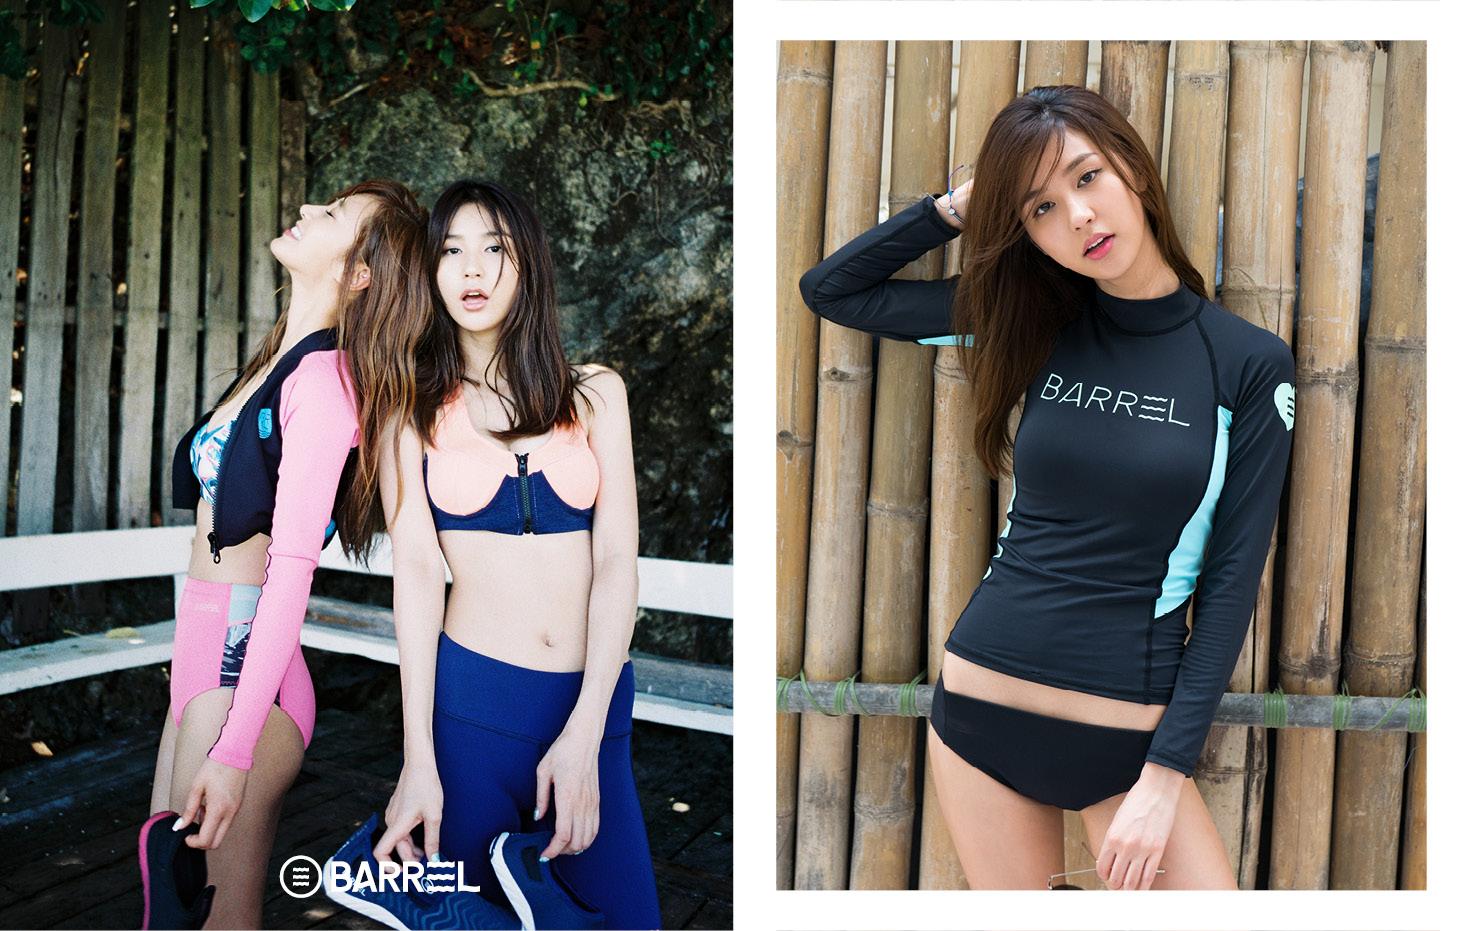 Opinion you girls generation bikini remarkable, rather